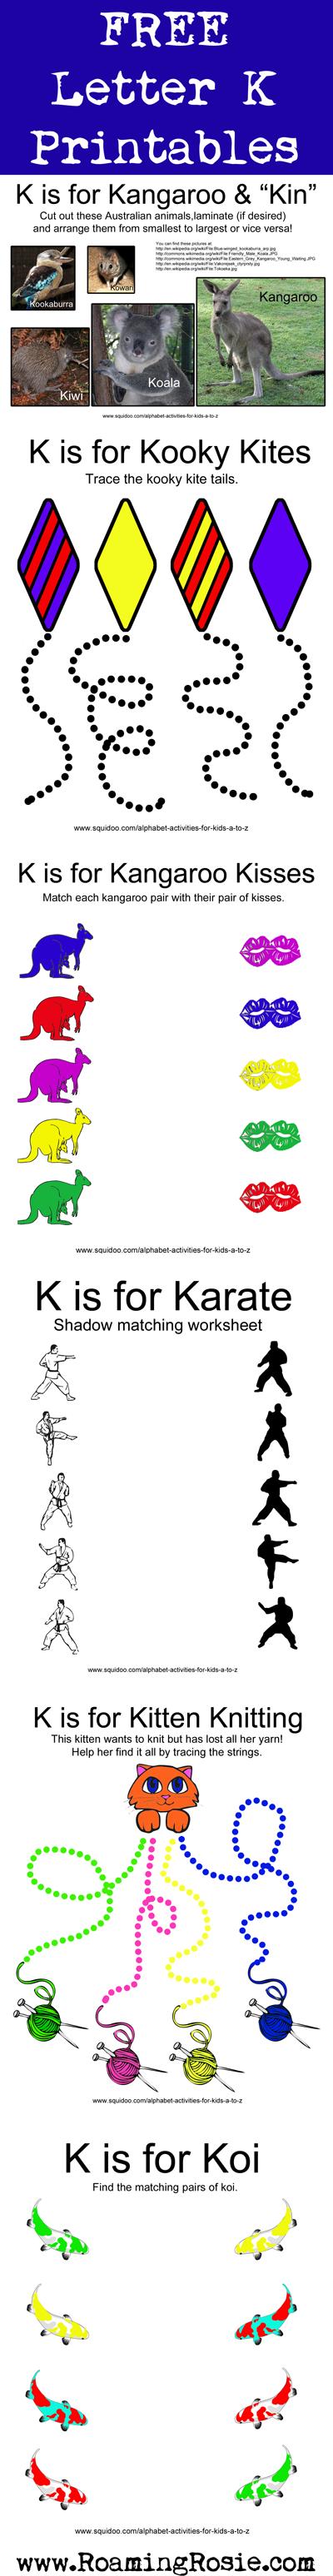 Letter K Printables